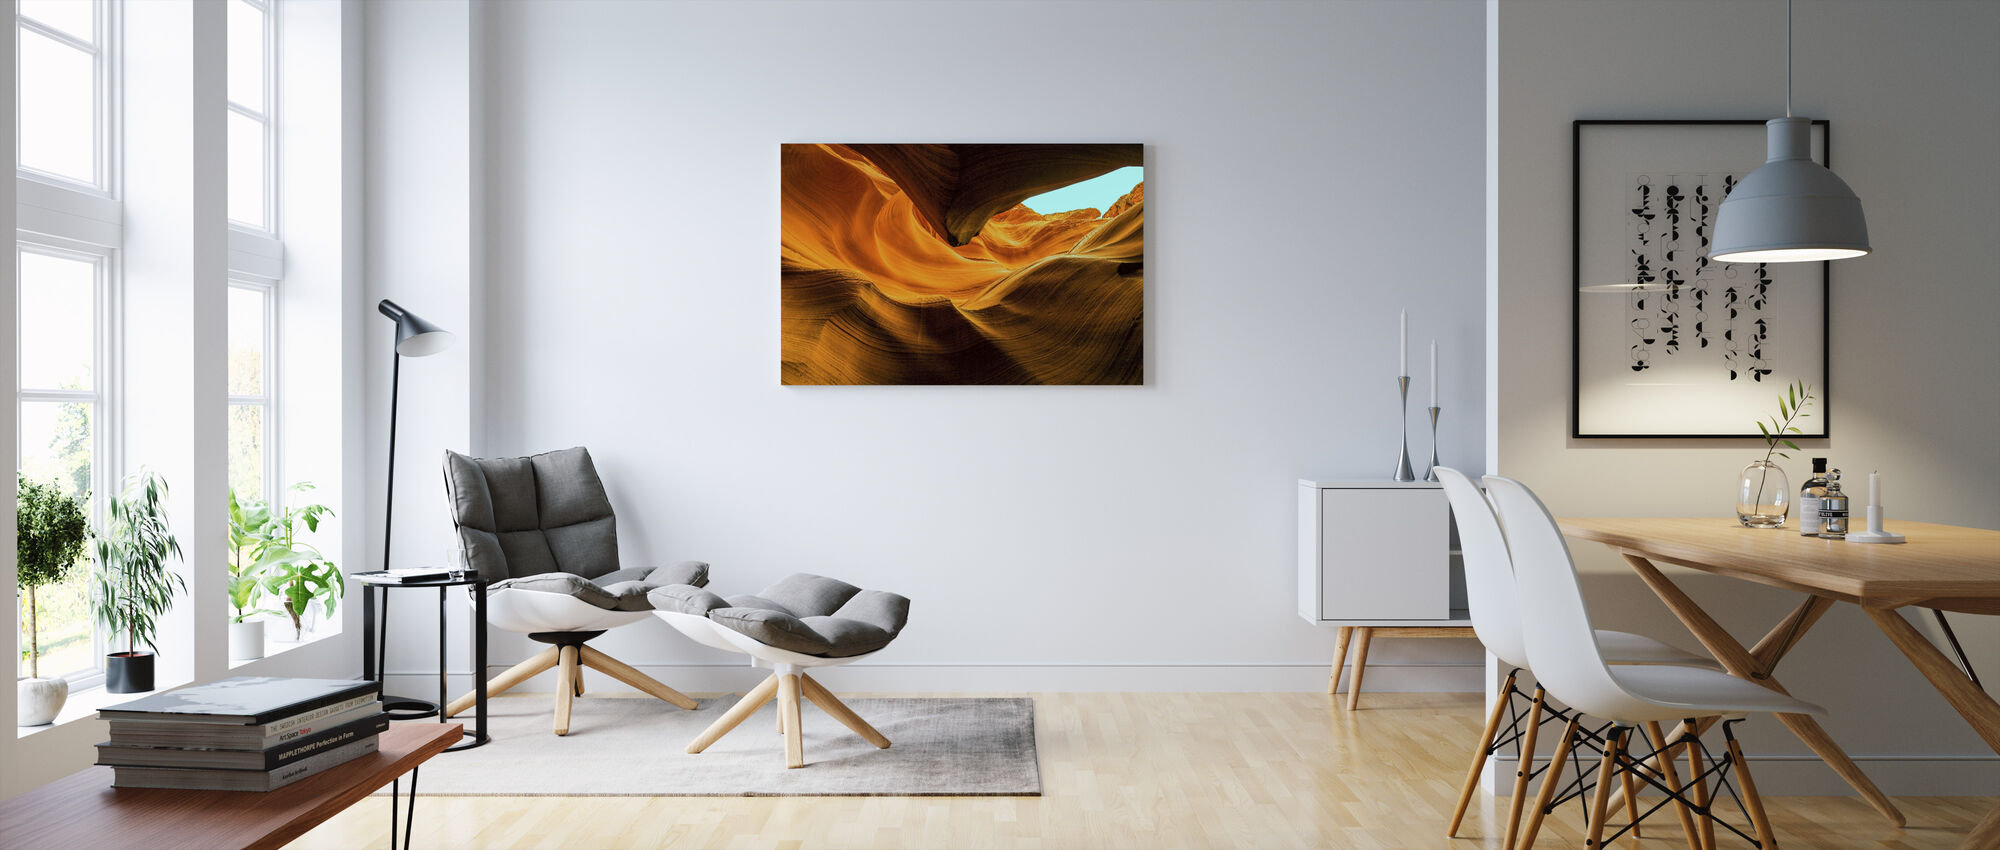 Arizona Canyon - Canvas print - Living Room